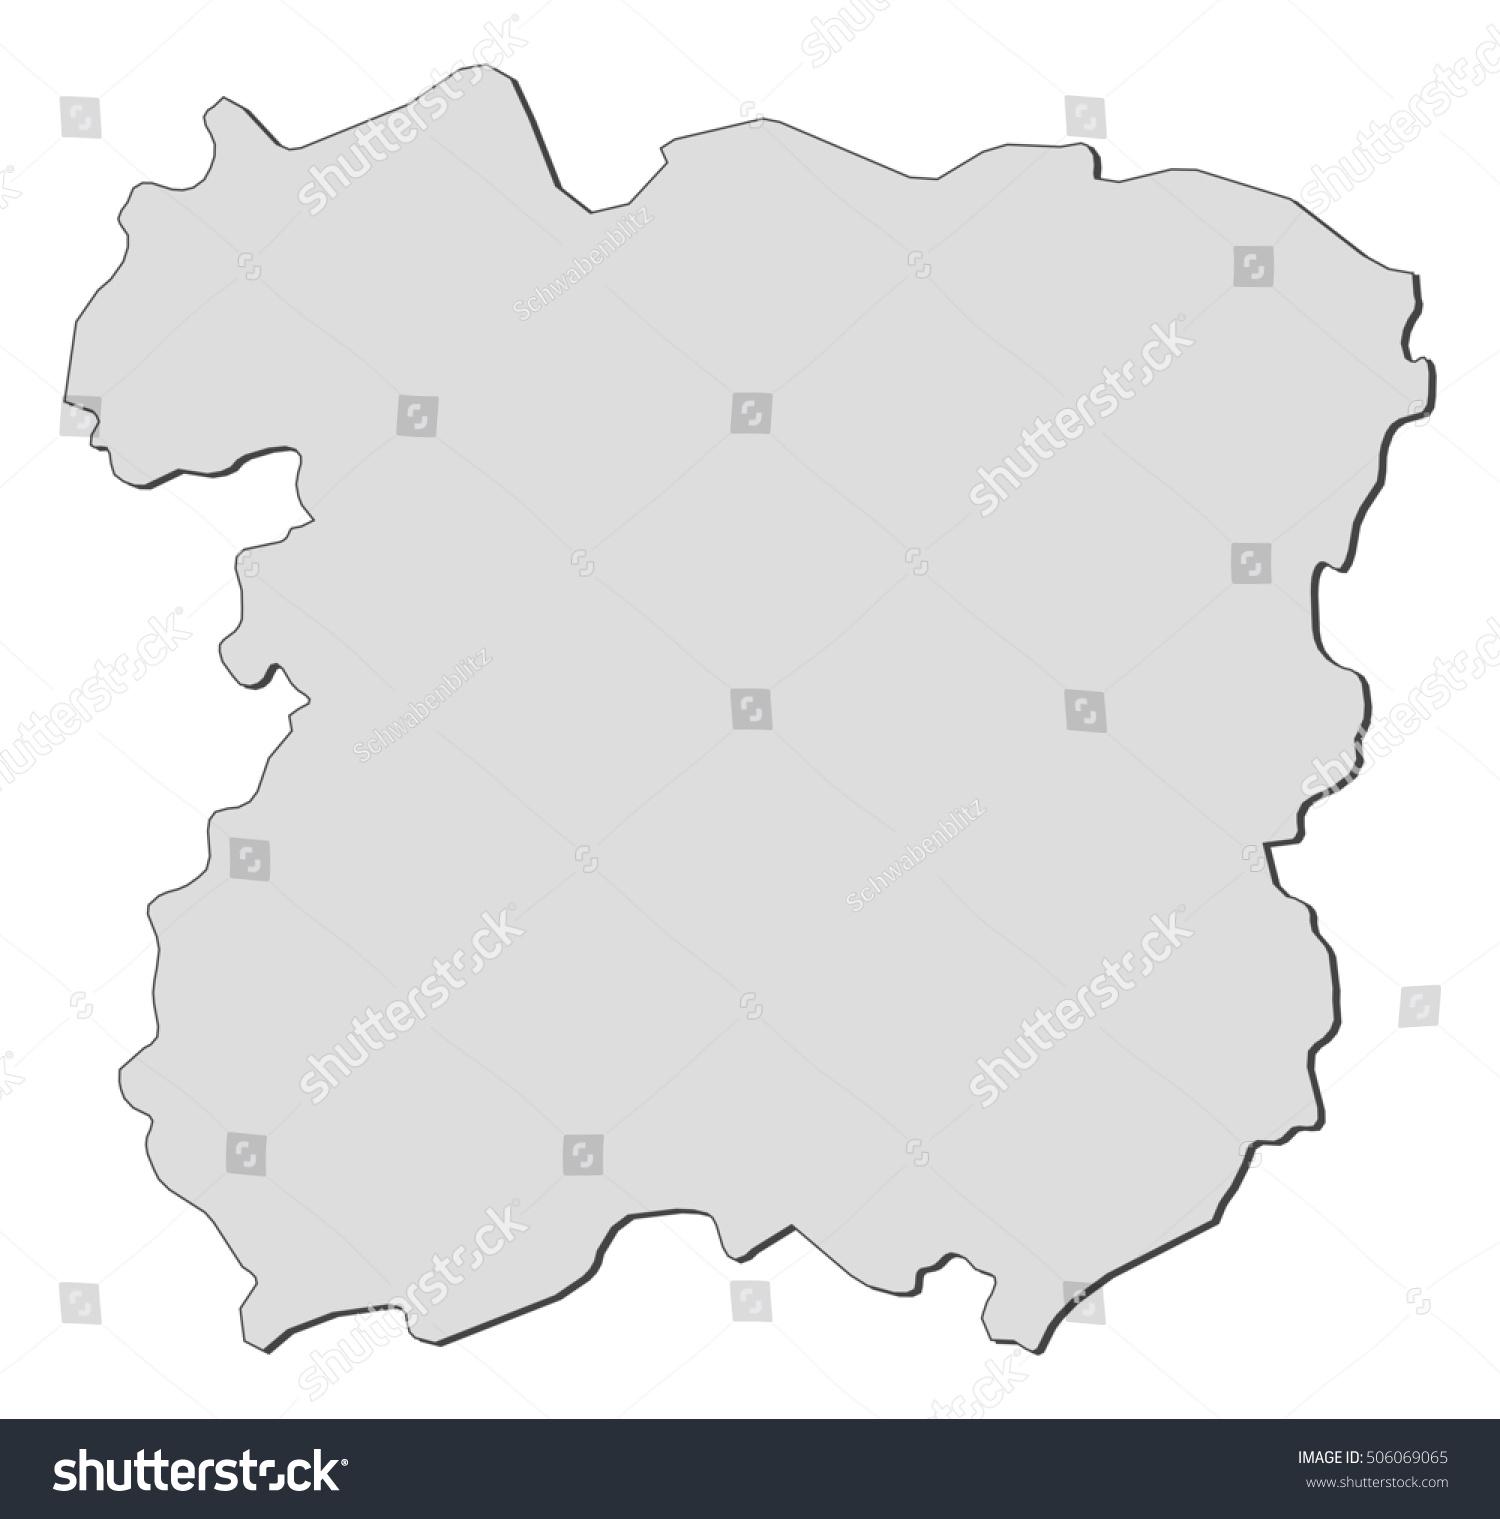 Map Siauliai Lithuania Stock Photo Photo Vector Illustration